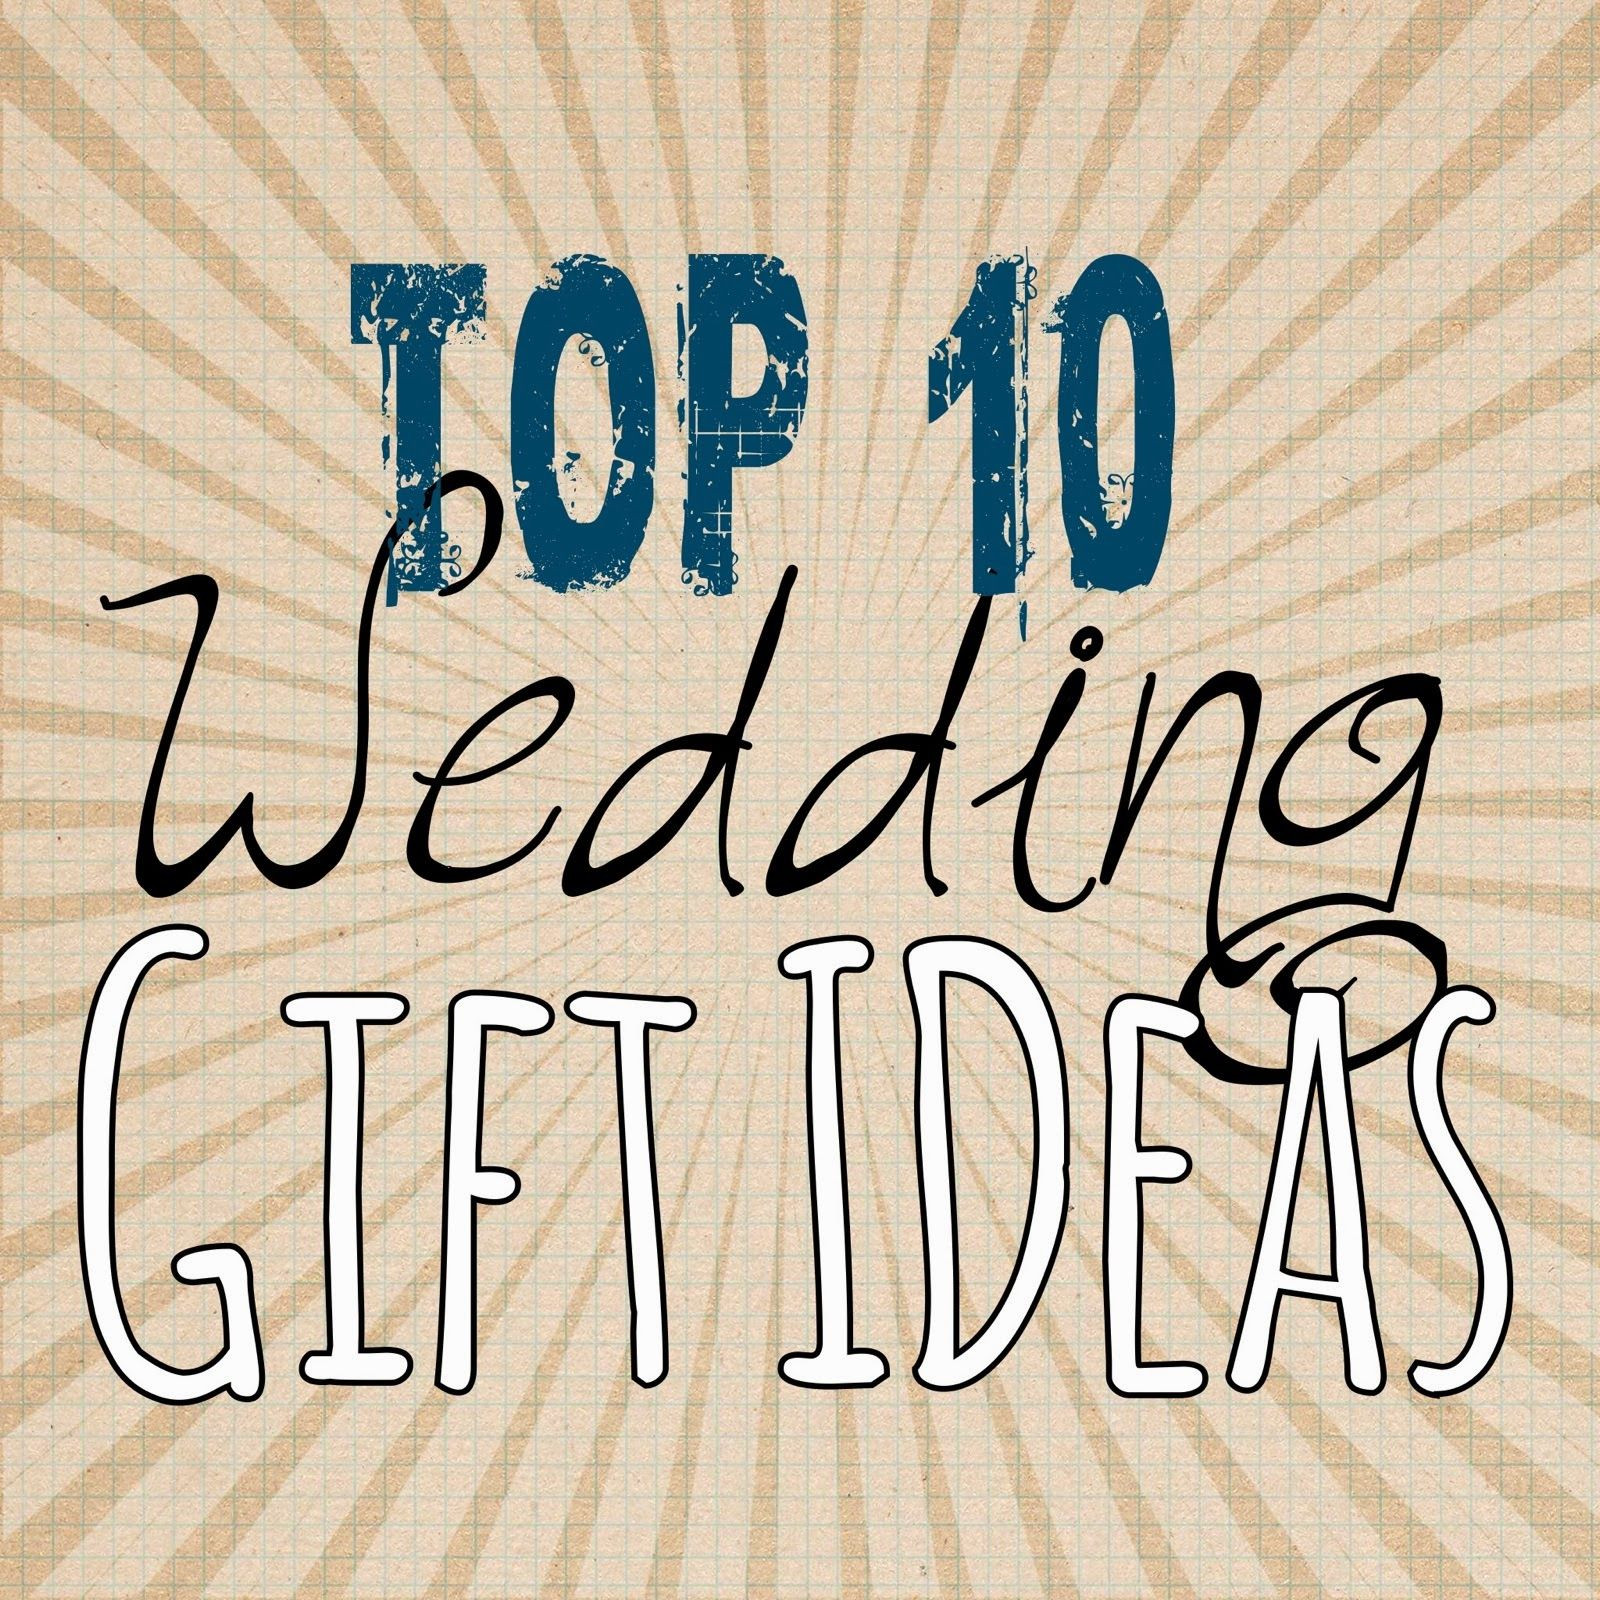 wedding gifts ideas regarding interest event category for wedding